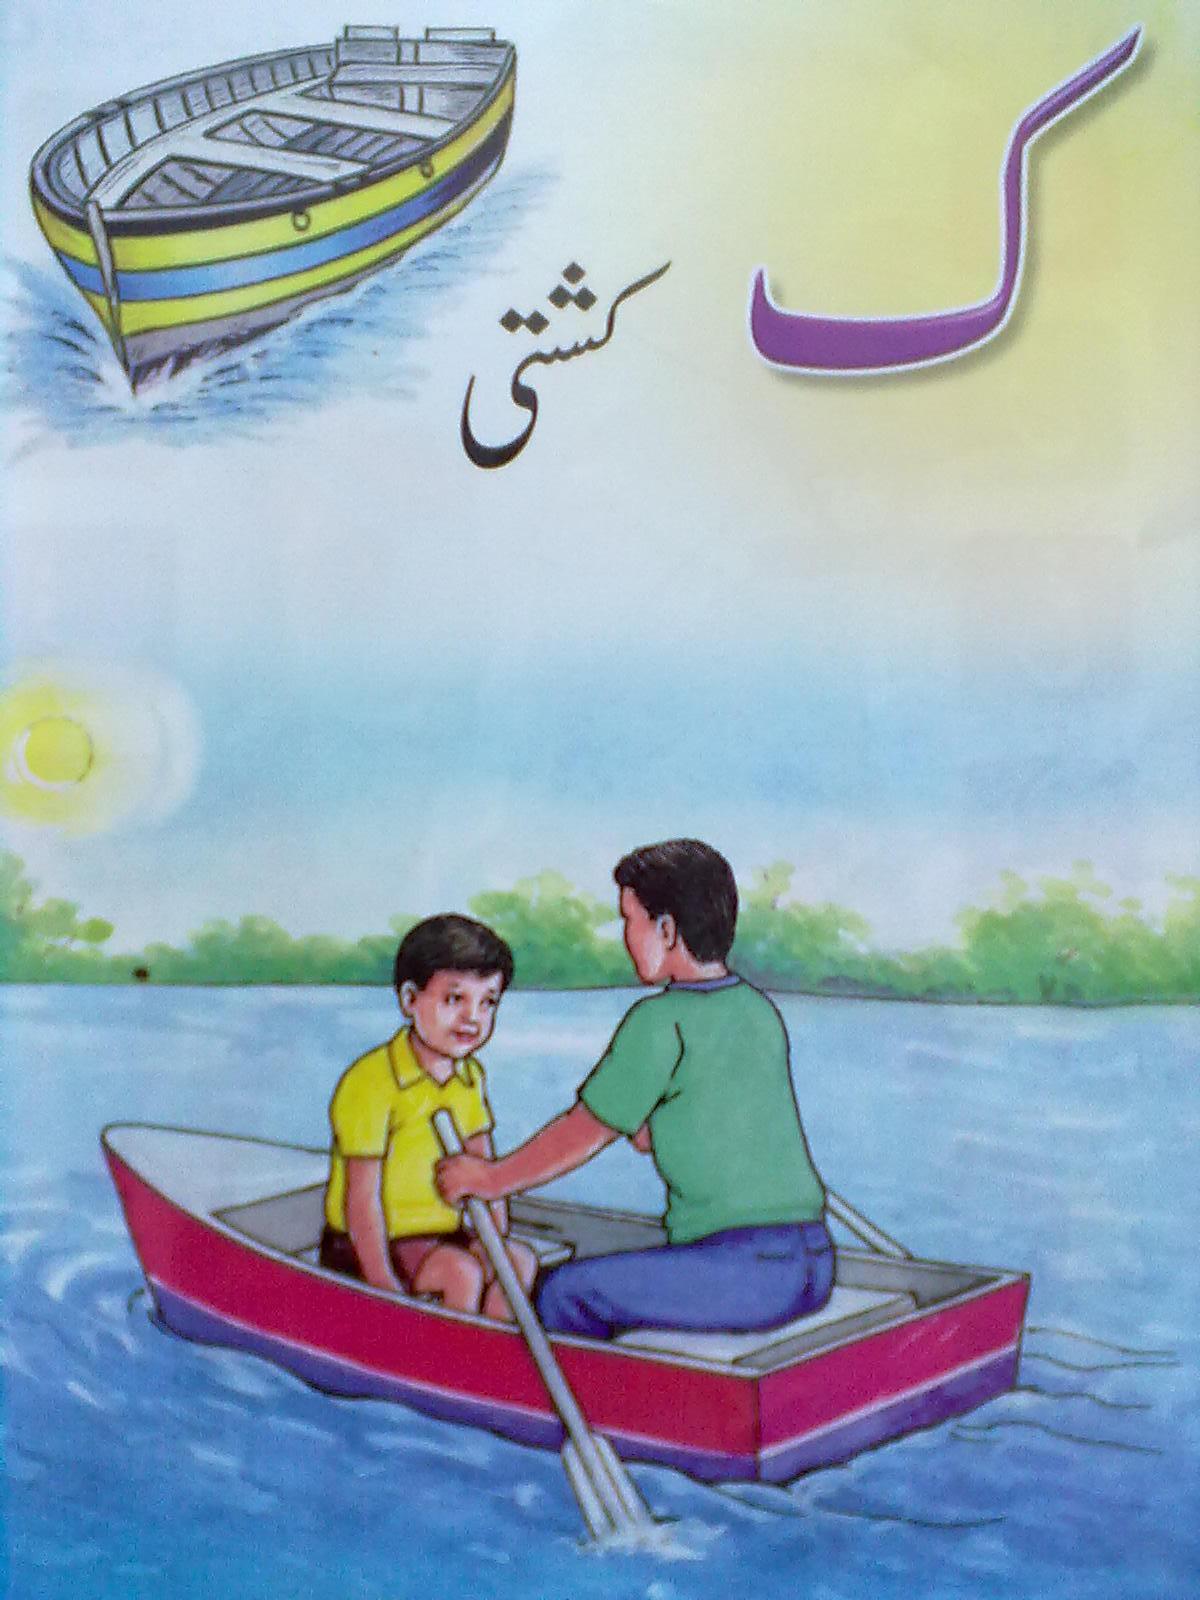 http://4.bp.blogspot.com/-MM0EI3LzjYw/TnzZjJoxeaI/AAAAAAAAAVk/CvW7ob2Tps4/s1600/Urdu+Alphabet+-+Kaf-With+Book+Page+Image.jpg